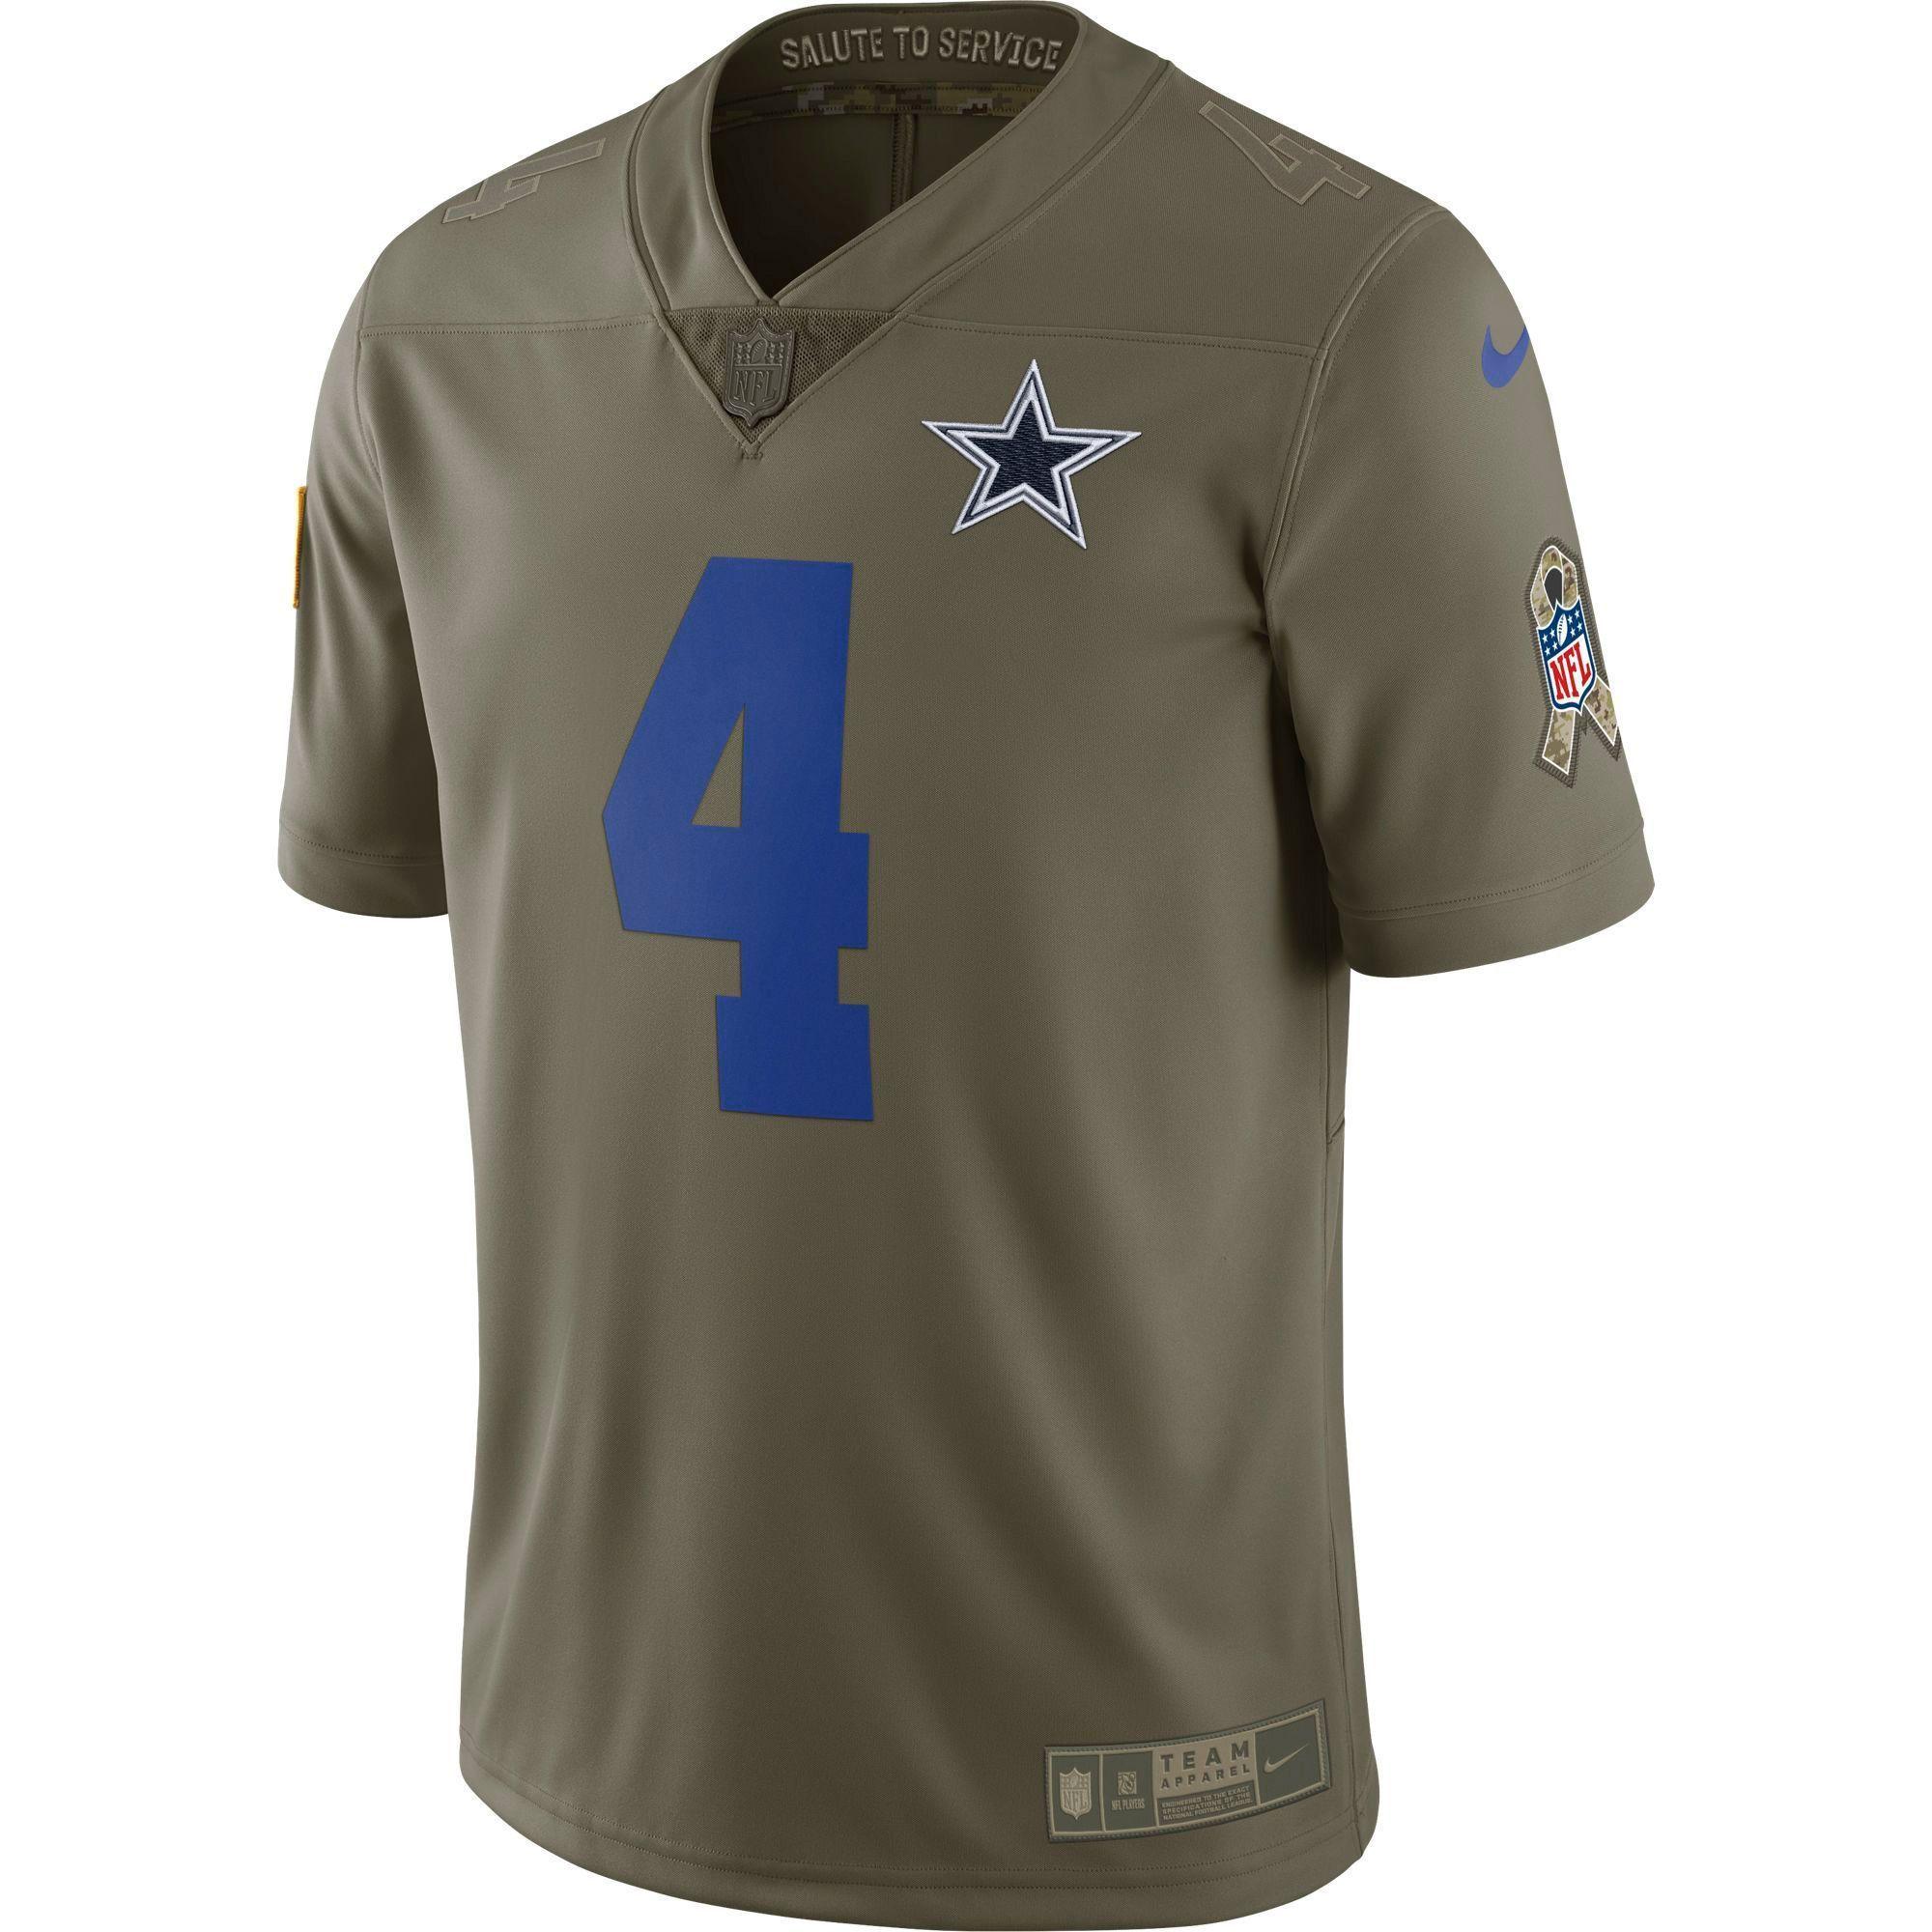 79bd6f17377 Dallas Cowboys Dak Prescott  4 Salute To Service Football Jersey ...